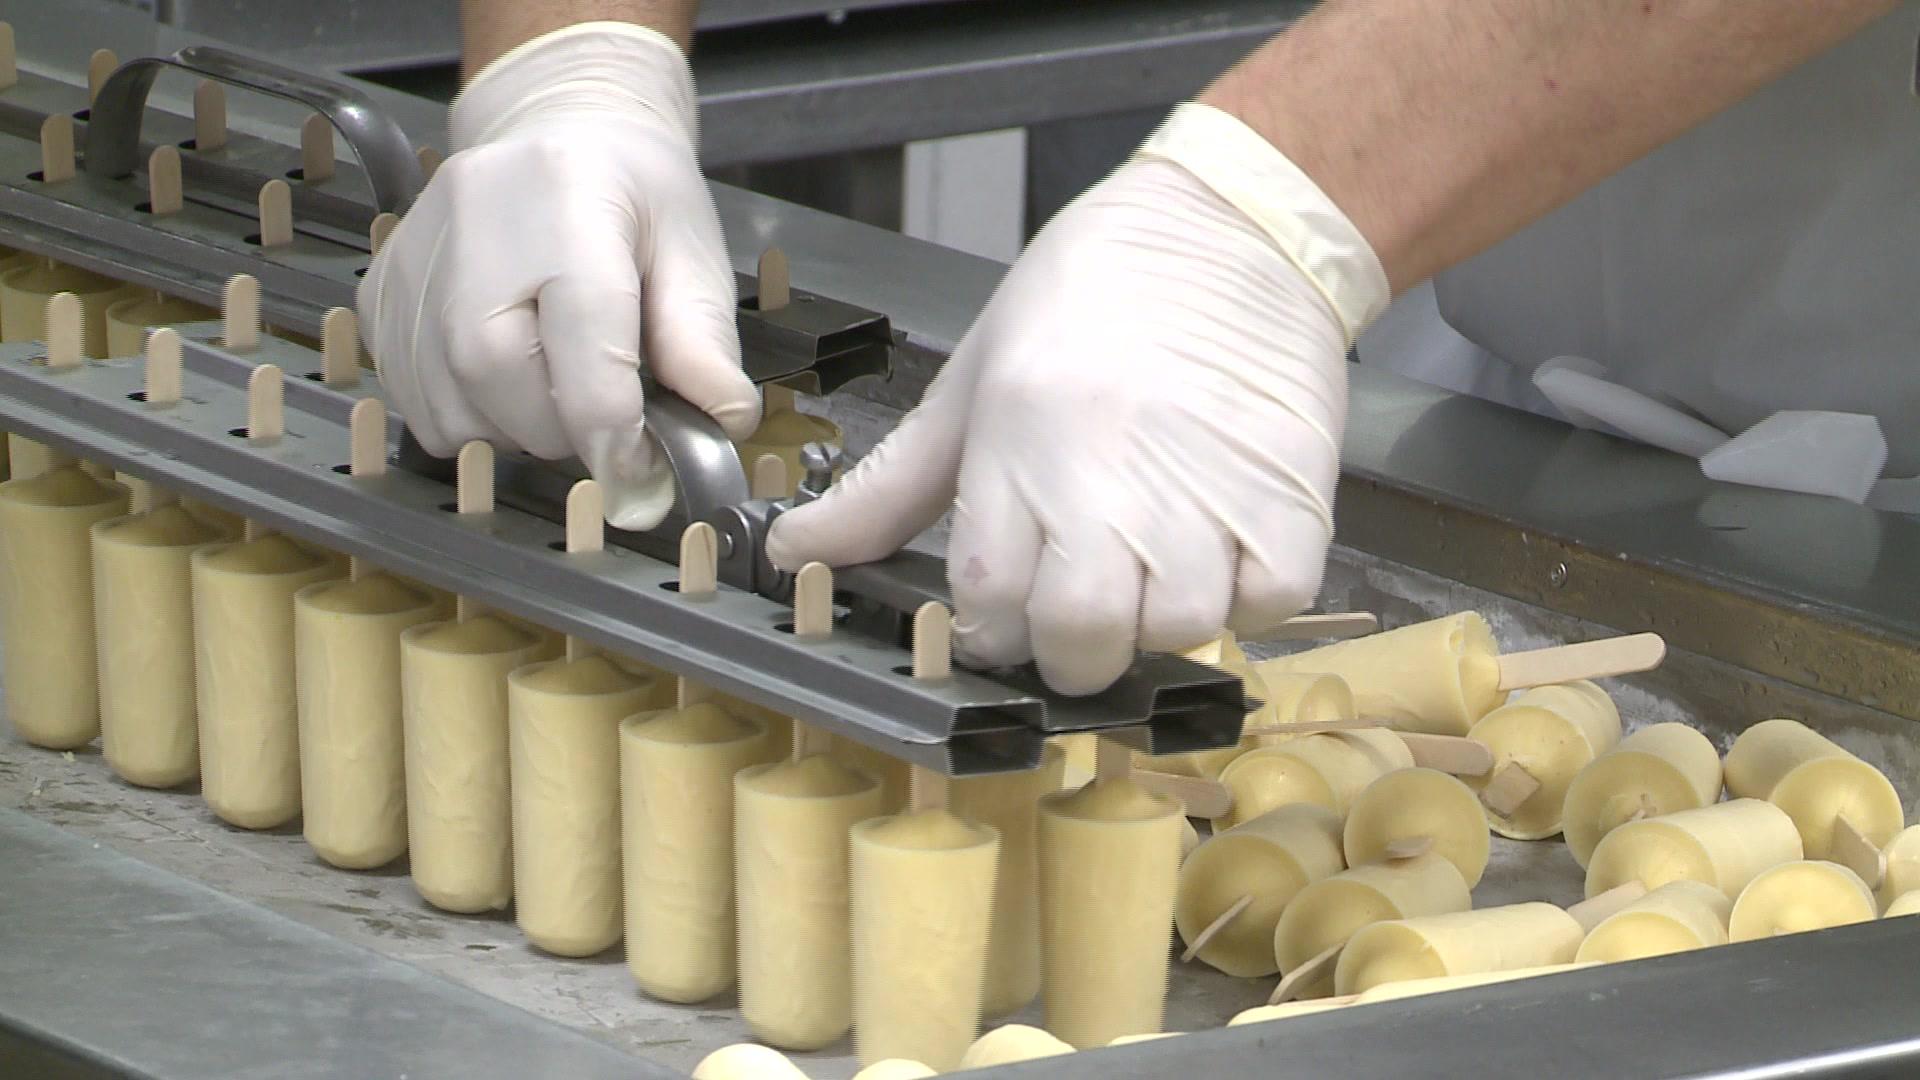 Kulfi: The Healthy Alternative to Ice Cream